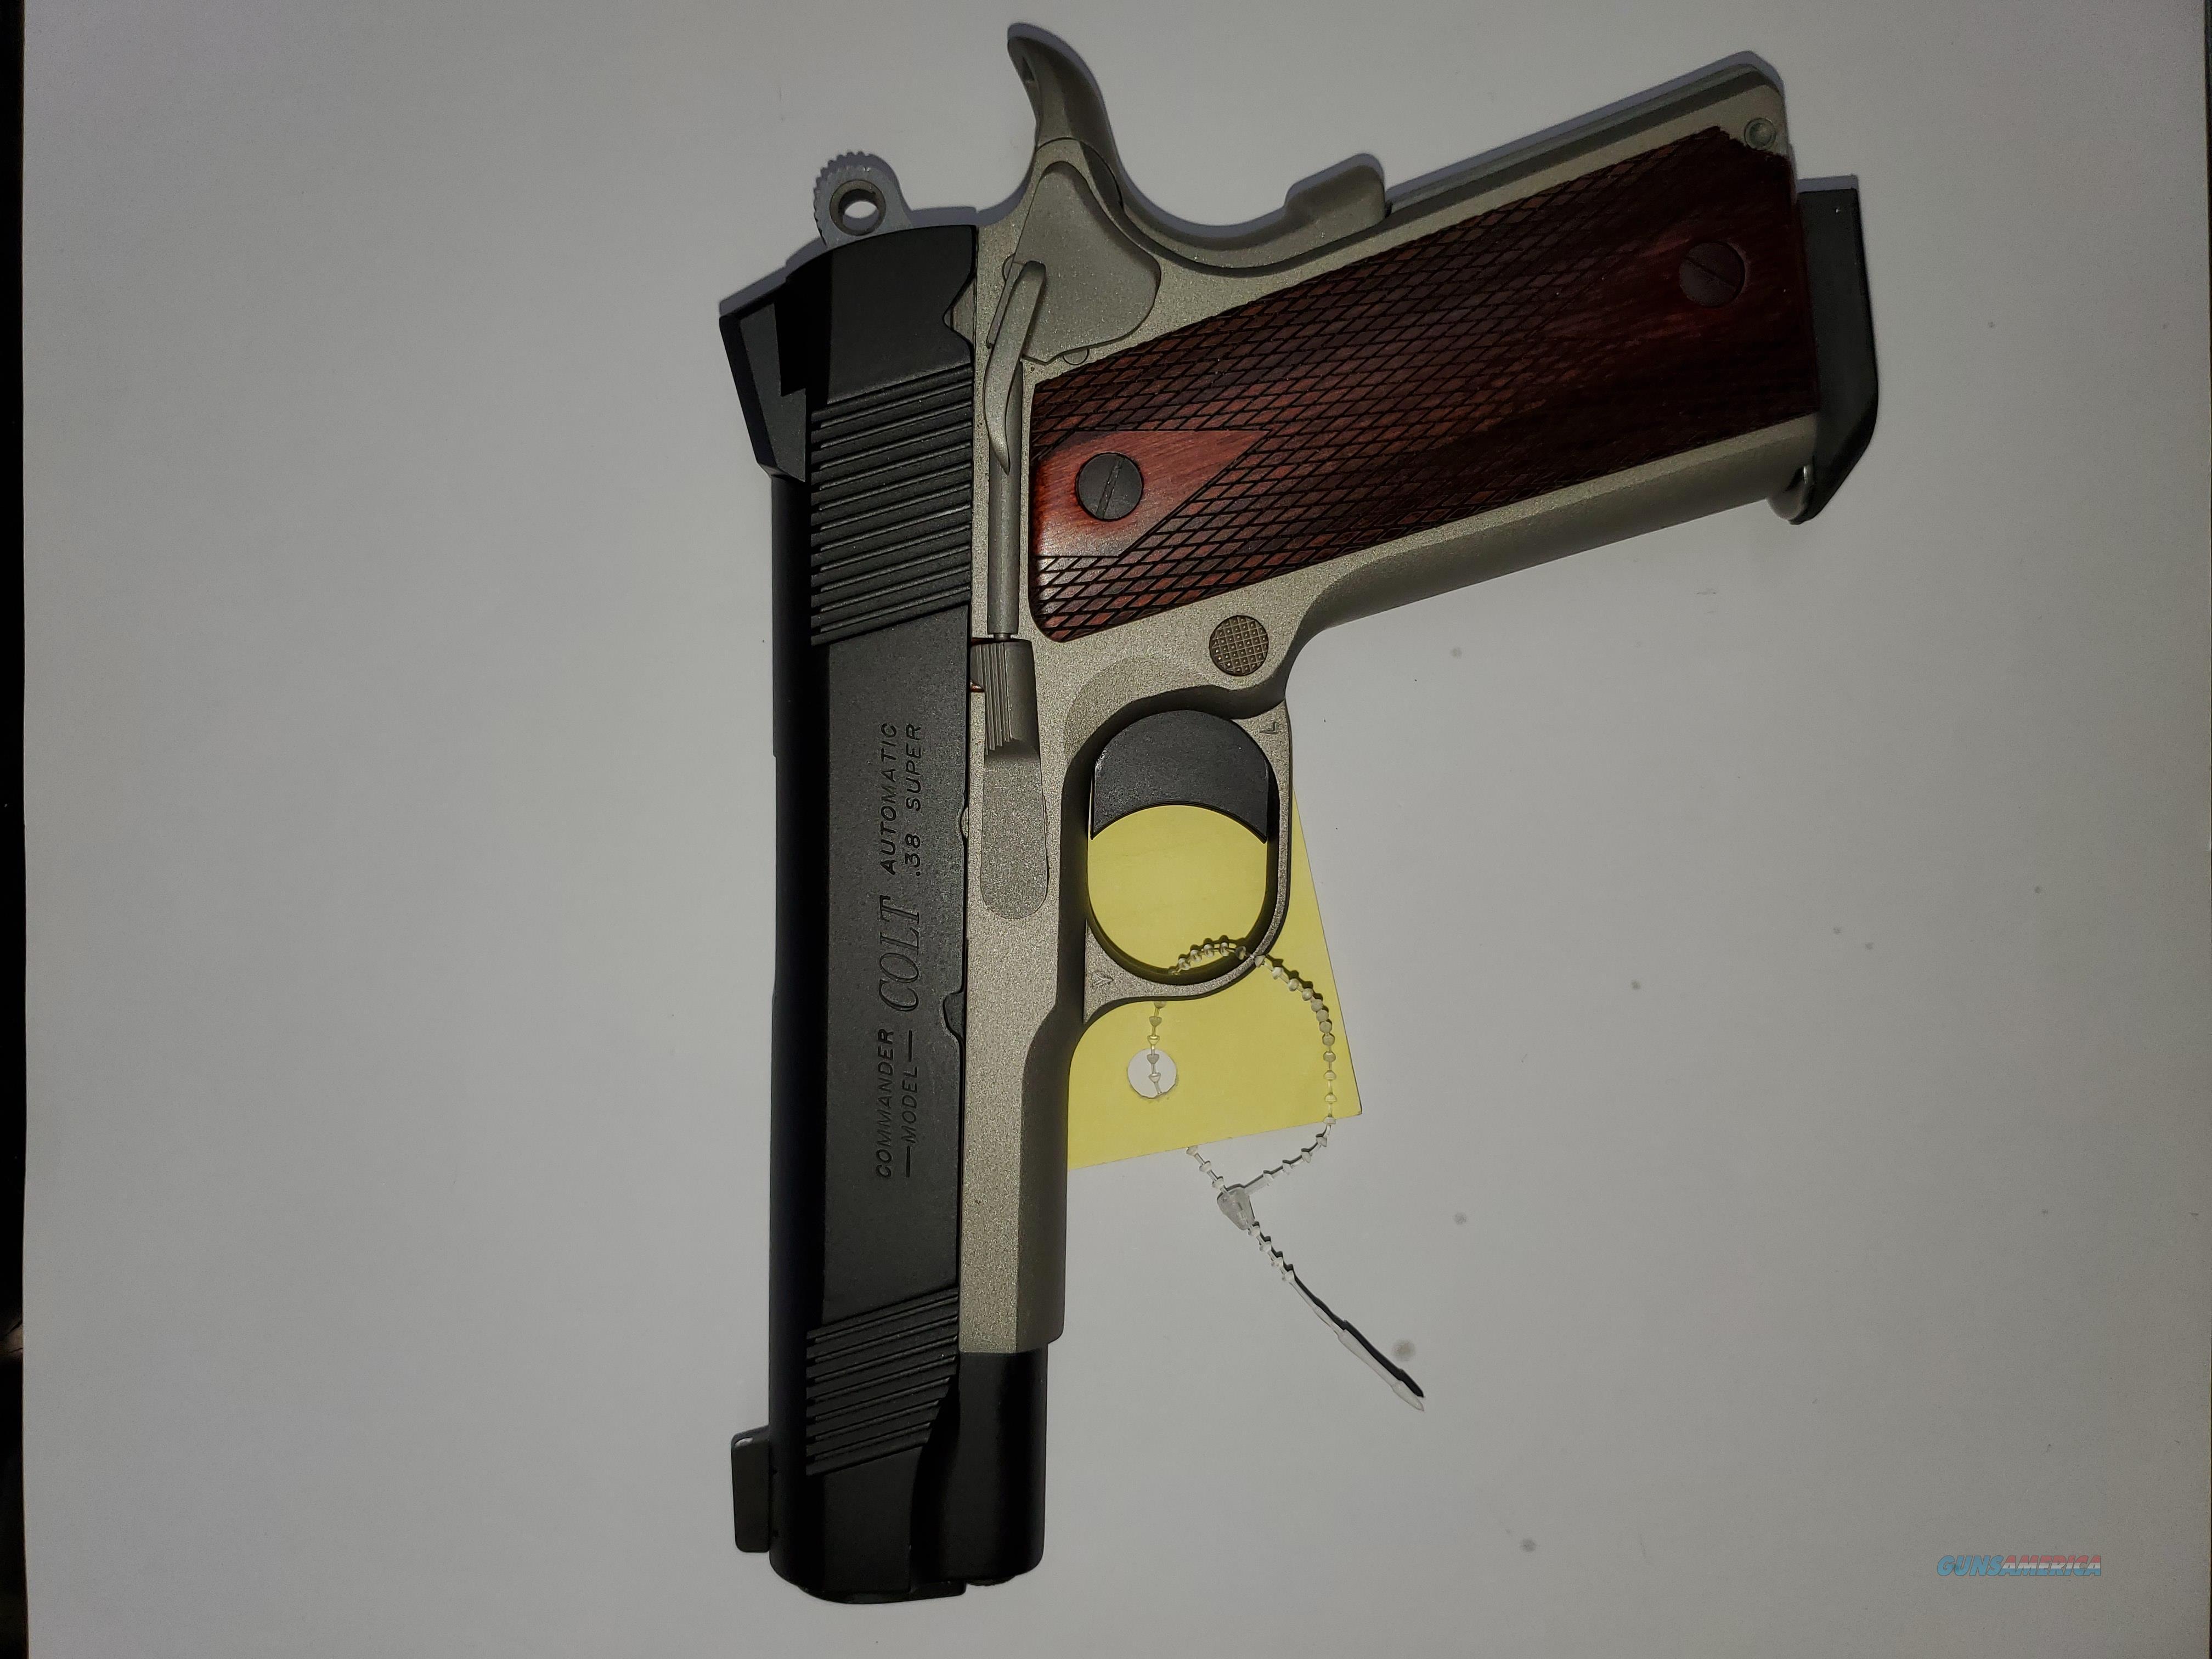 Colt commander 38 super  Guns > Pistols > Colt Automatic Pistols (1911 & Var)